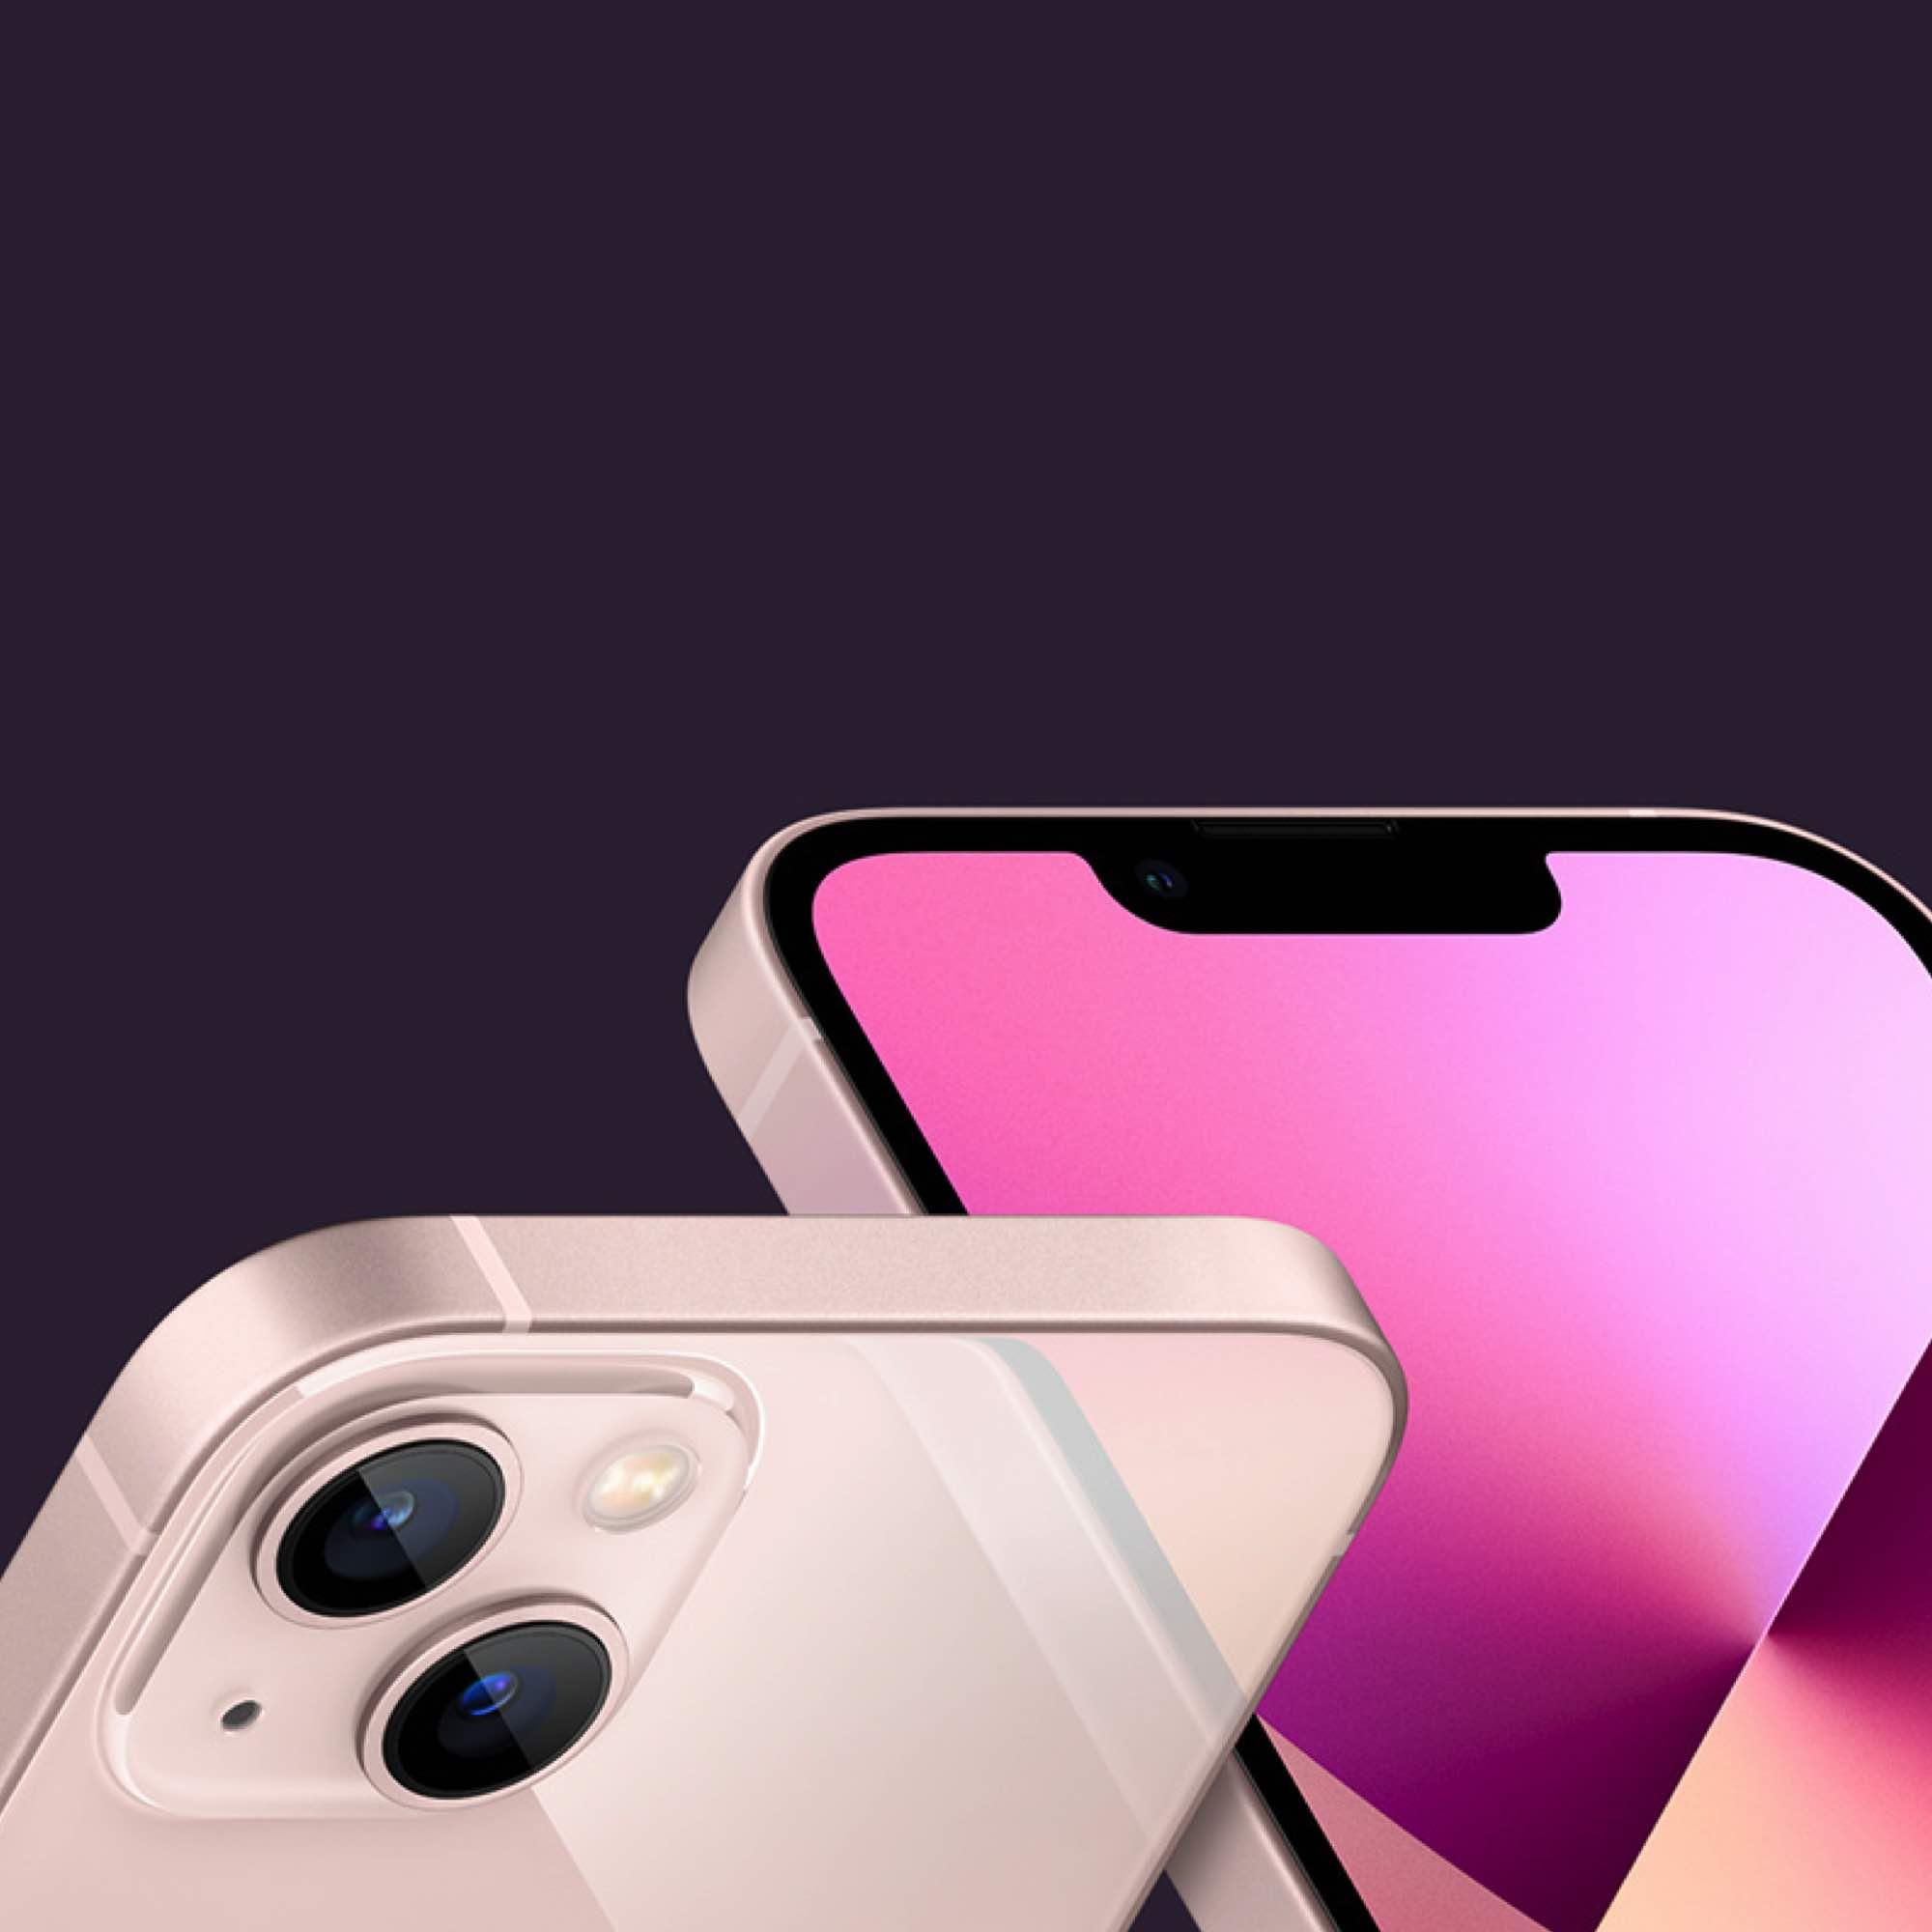 iPhone 13 Ninove